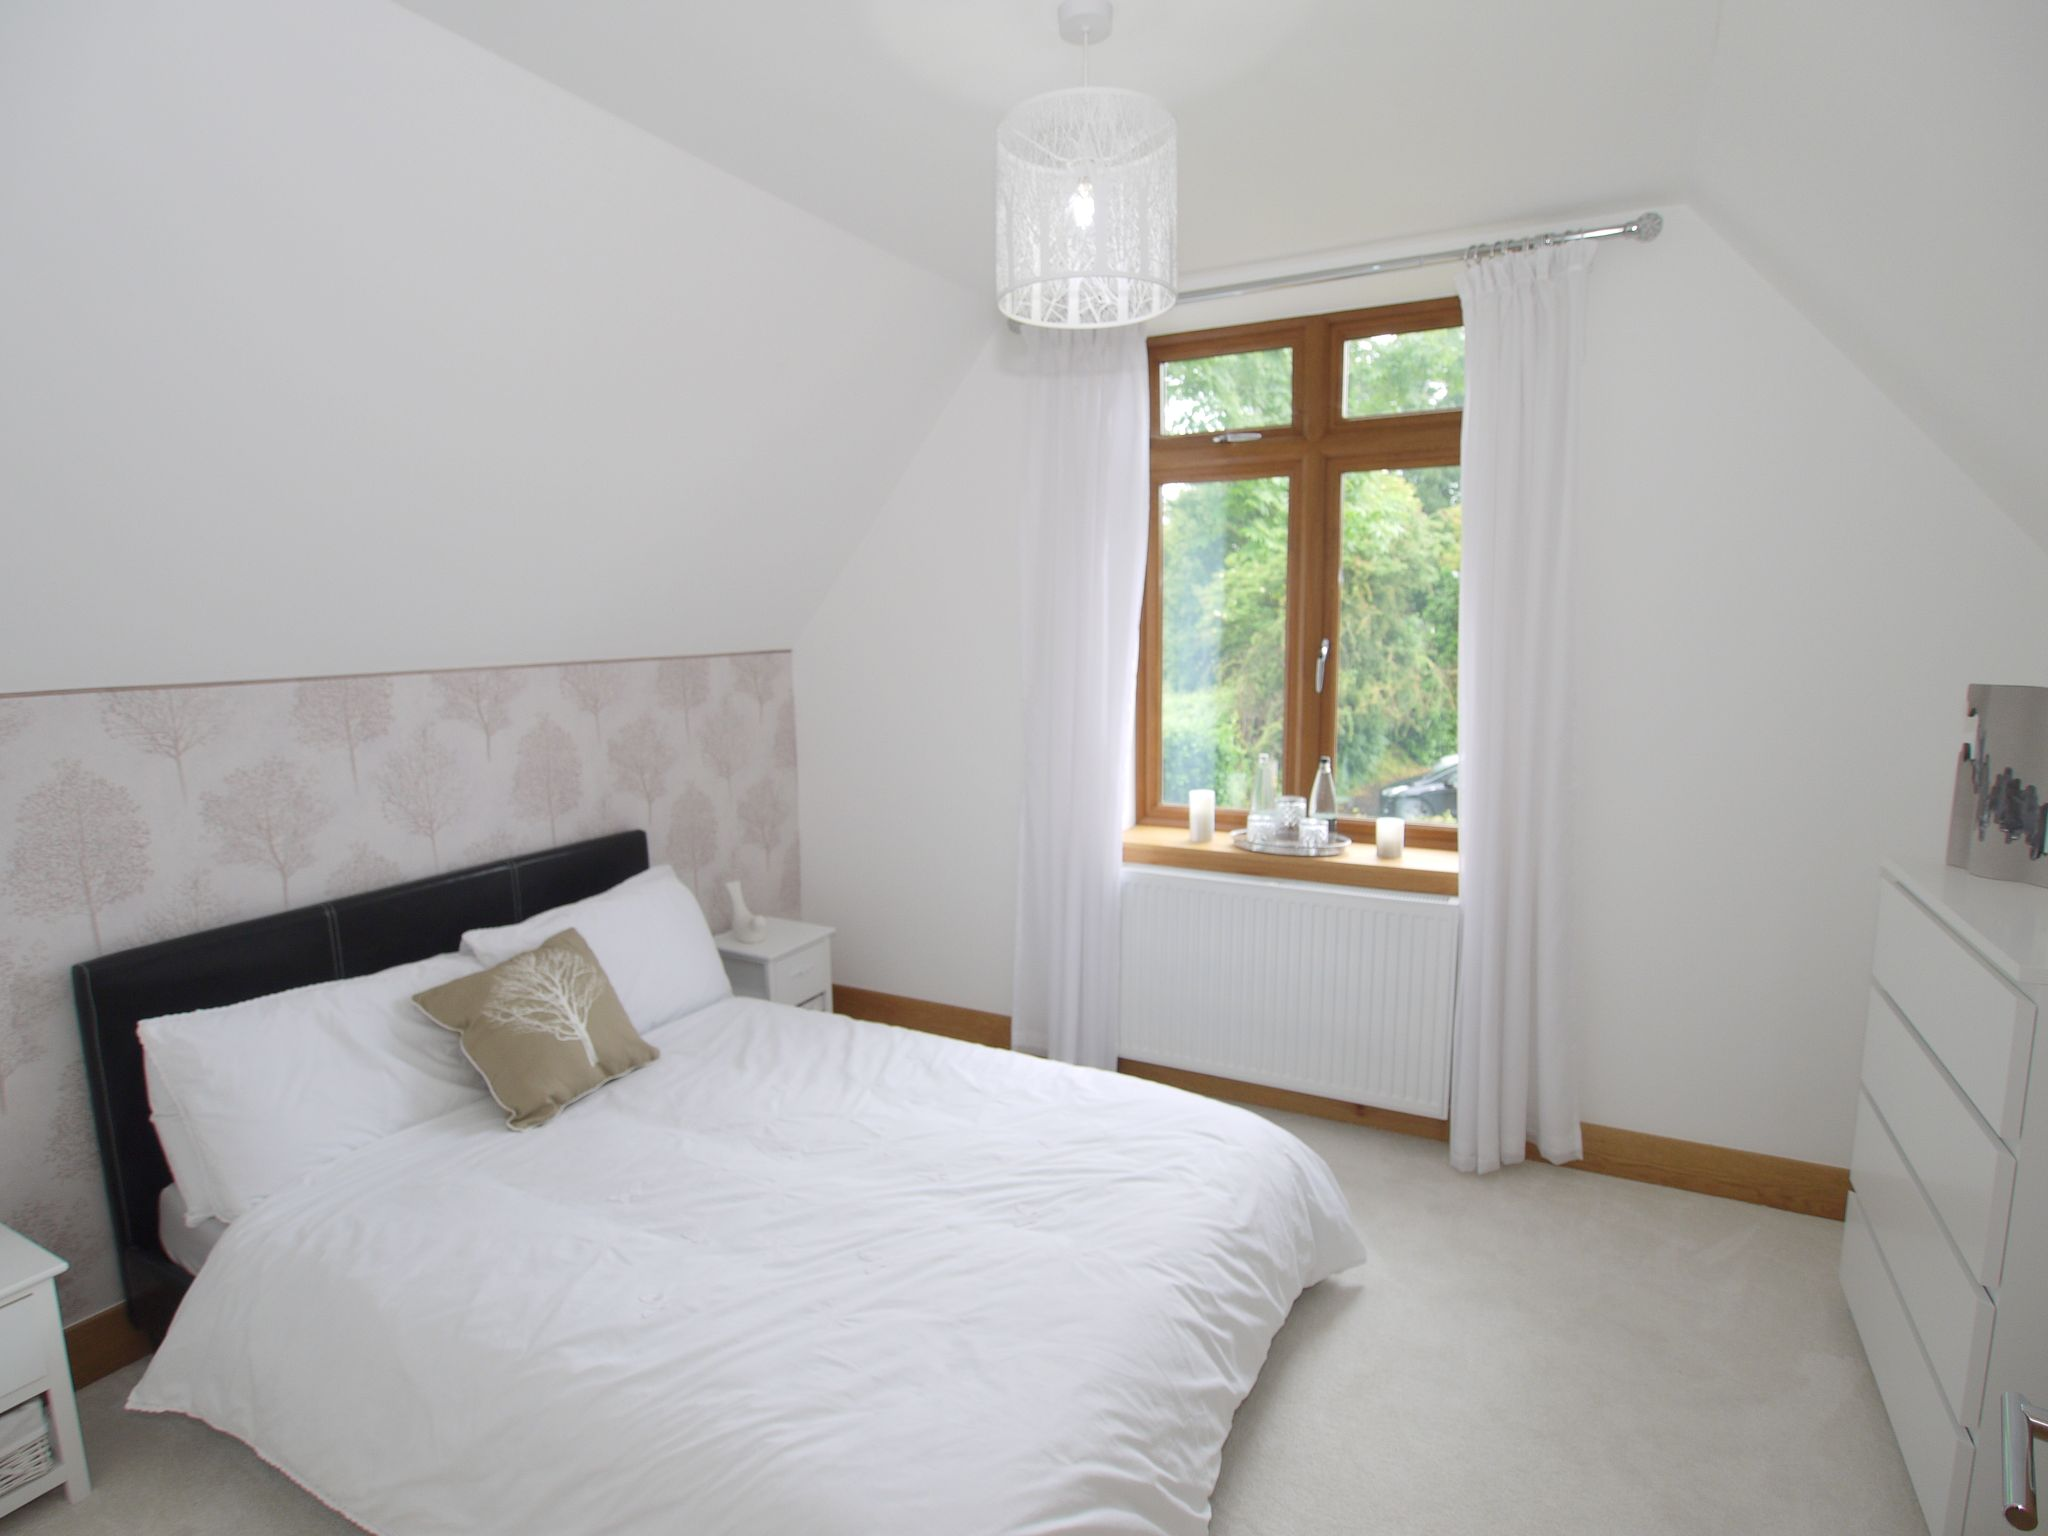 5 bedroom detached house Sold in Sevenoaks - Photograph 10